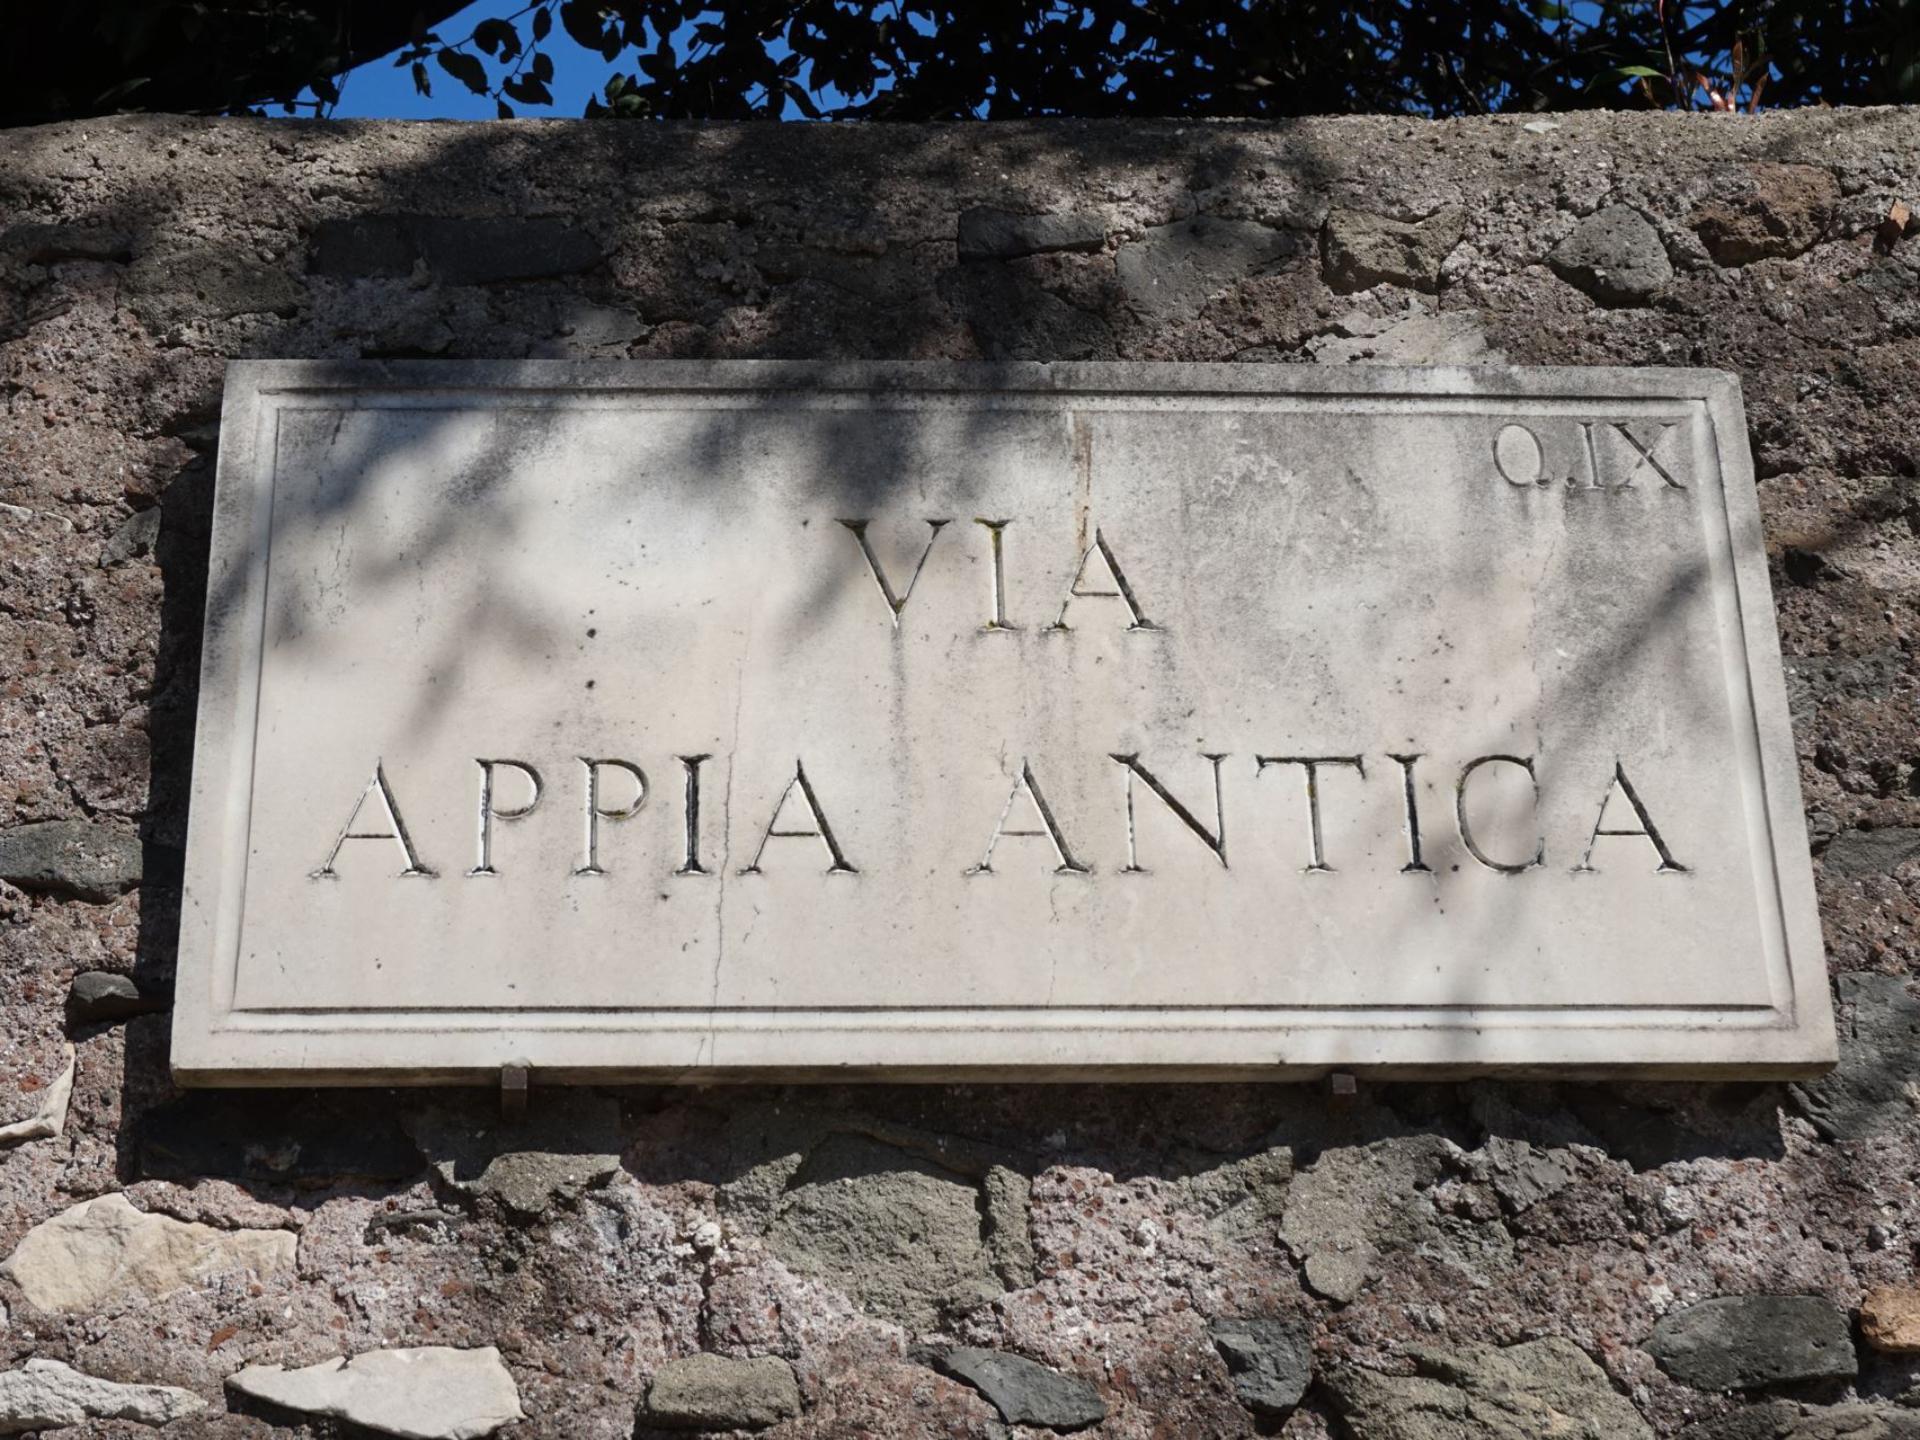 appian-way-2